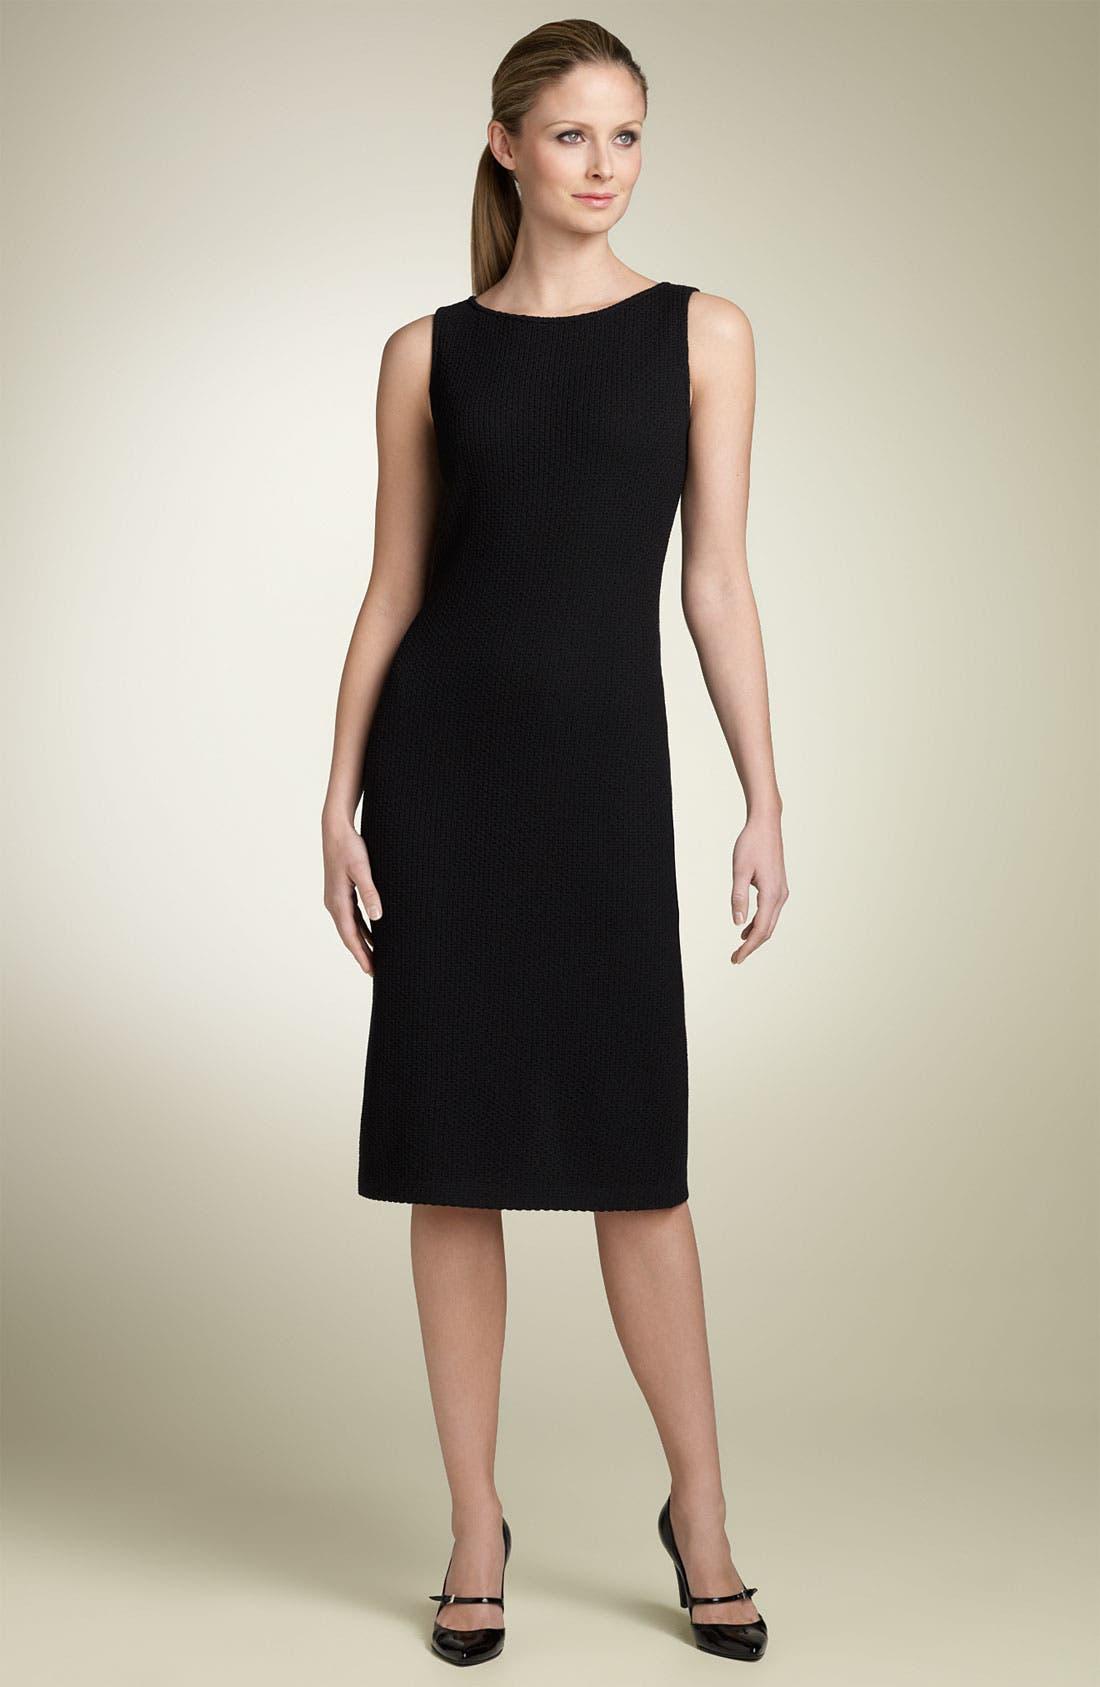 Main Image - St. John Collection Caviar Knit Dress